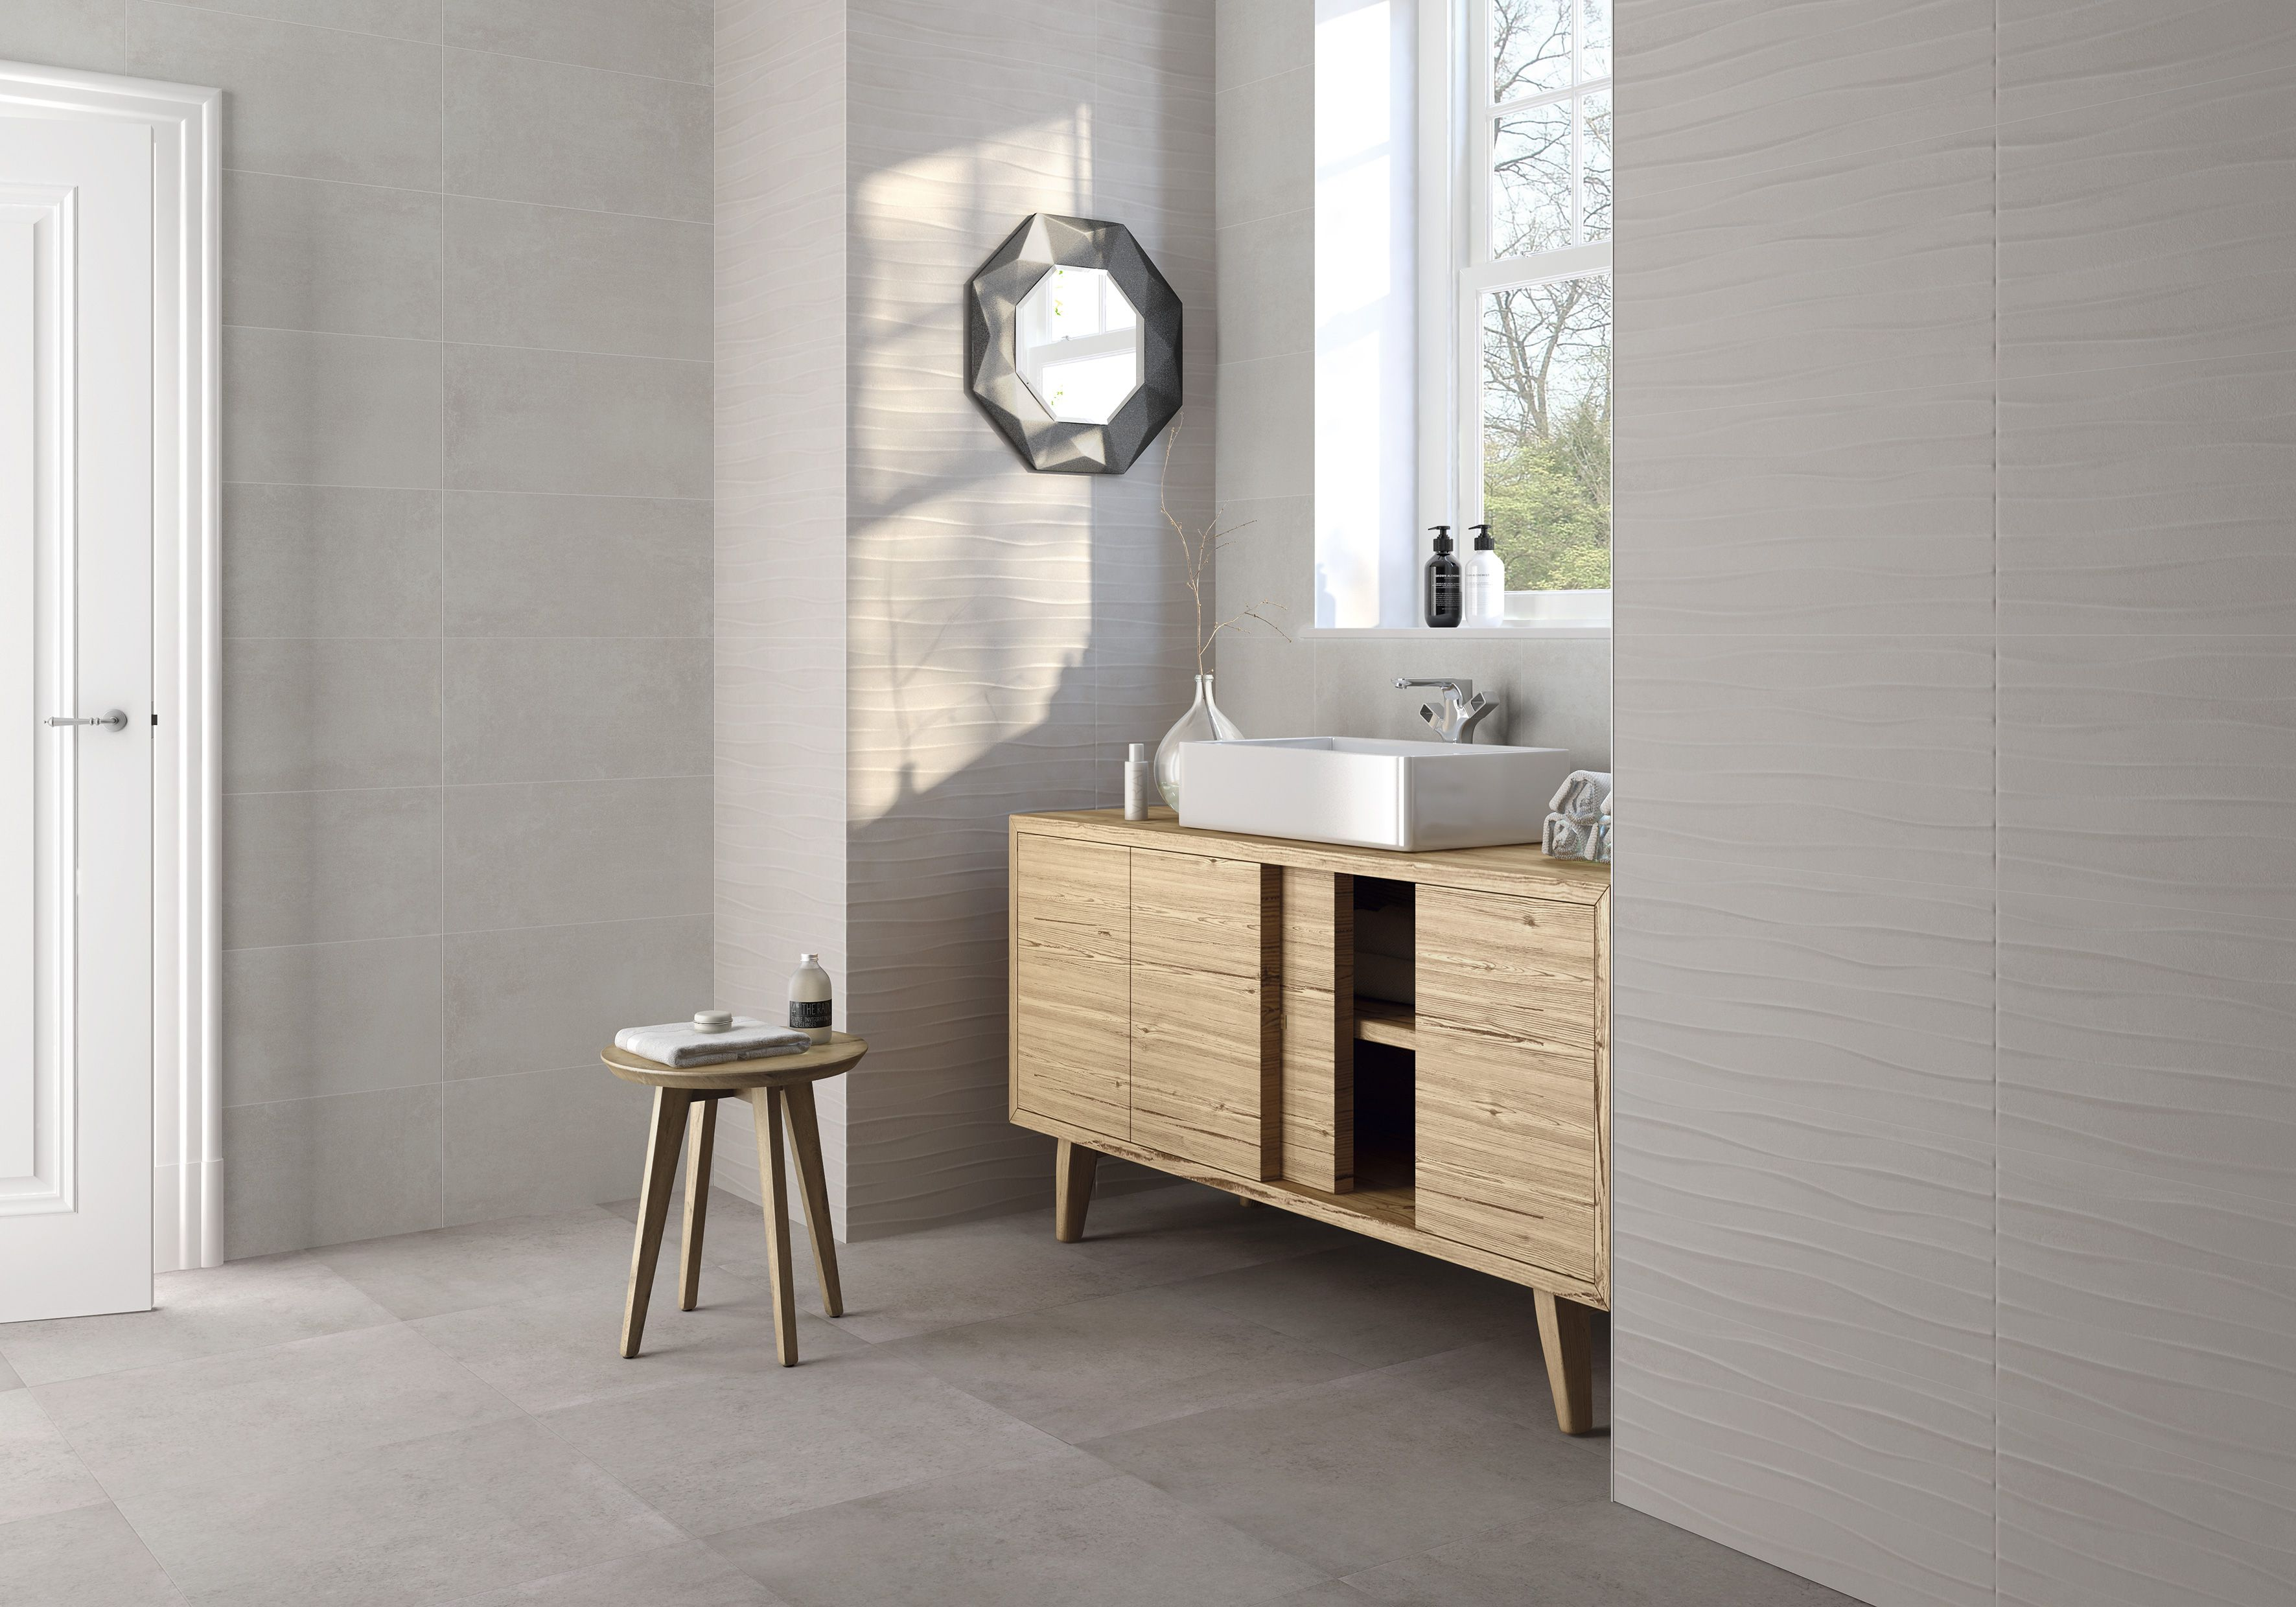 Meuble Salle De Bain Creamix ~ Pamesa Carrelage K Concept Pamesa Carrelage Sol Intrieur Grand